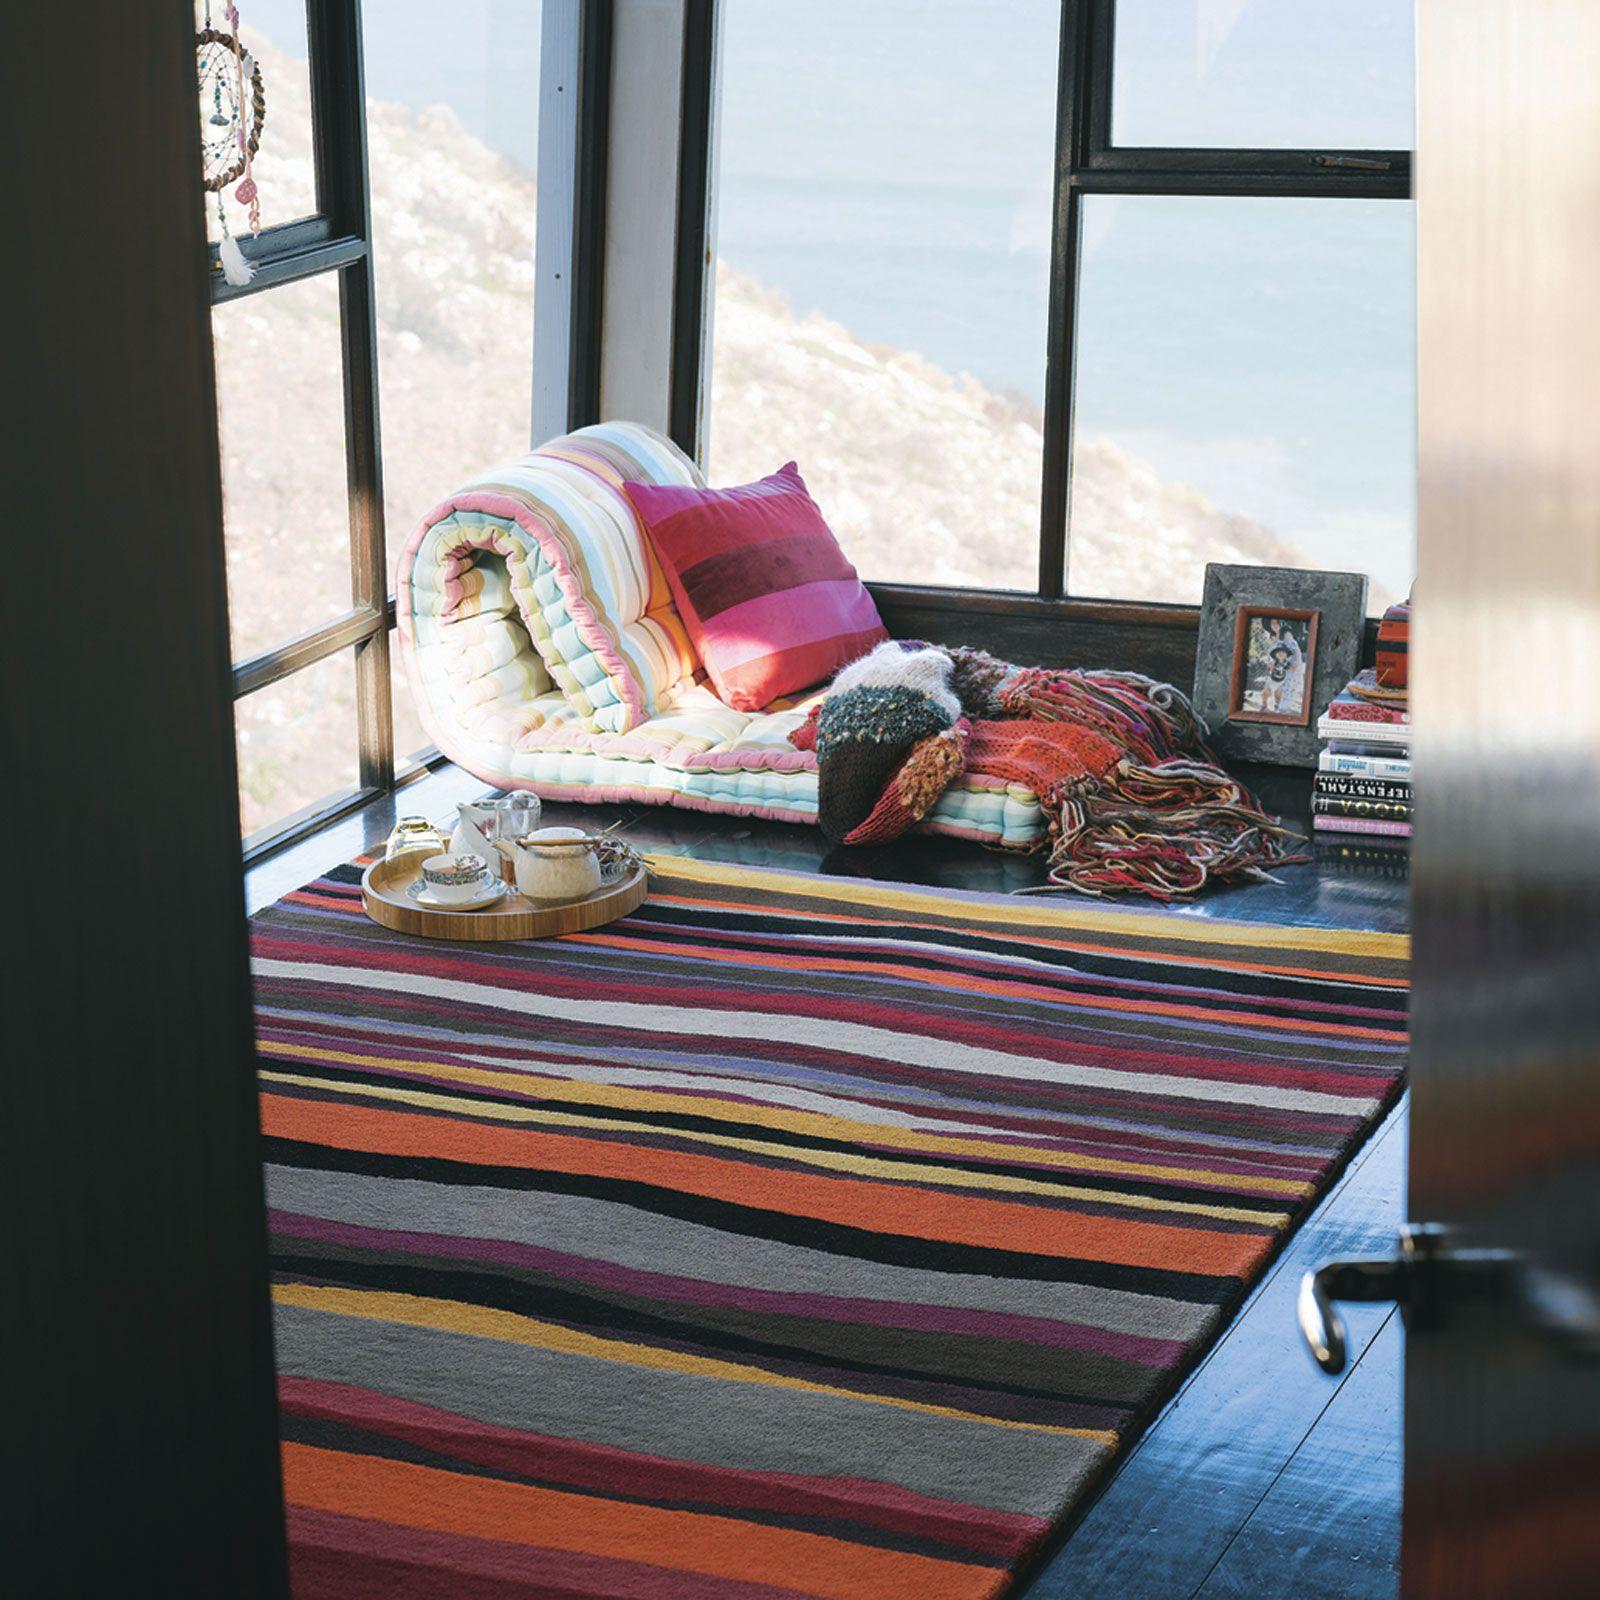 Estella Summer 85200 Wool Rugs By Brink Campman